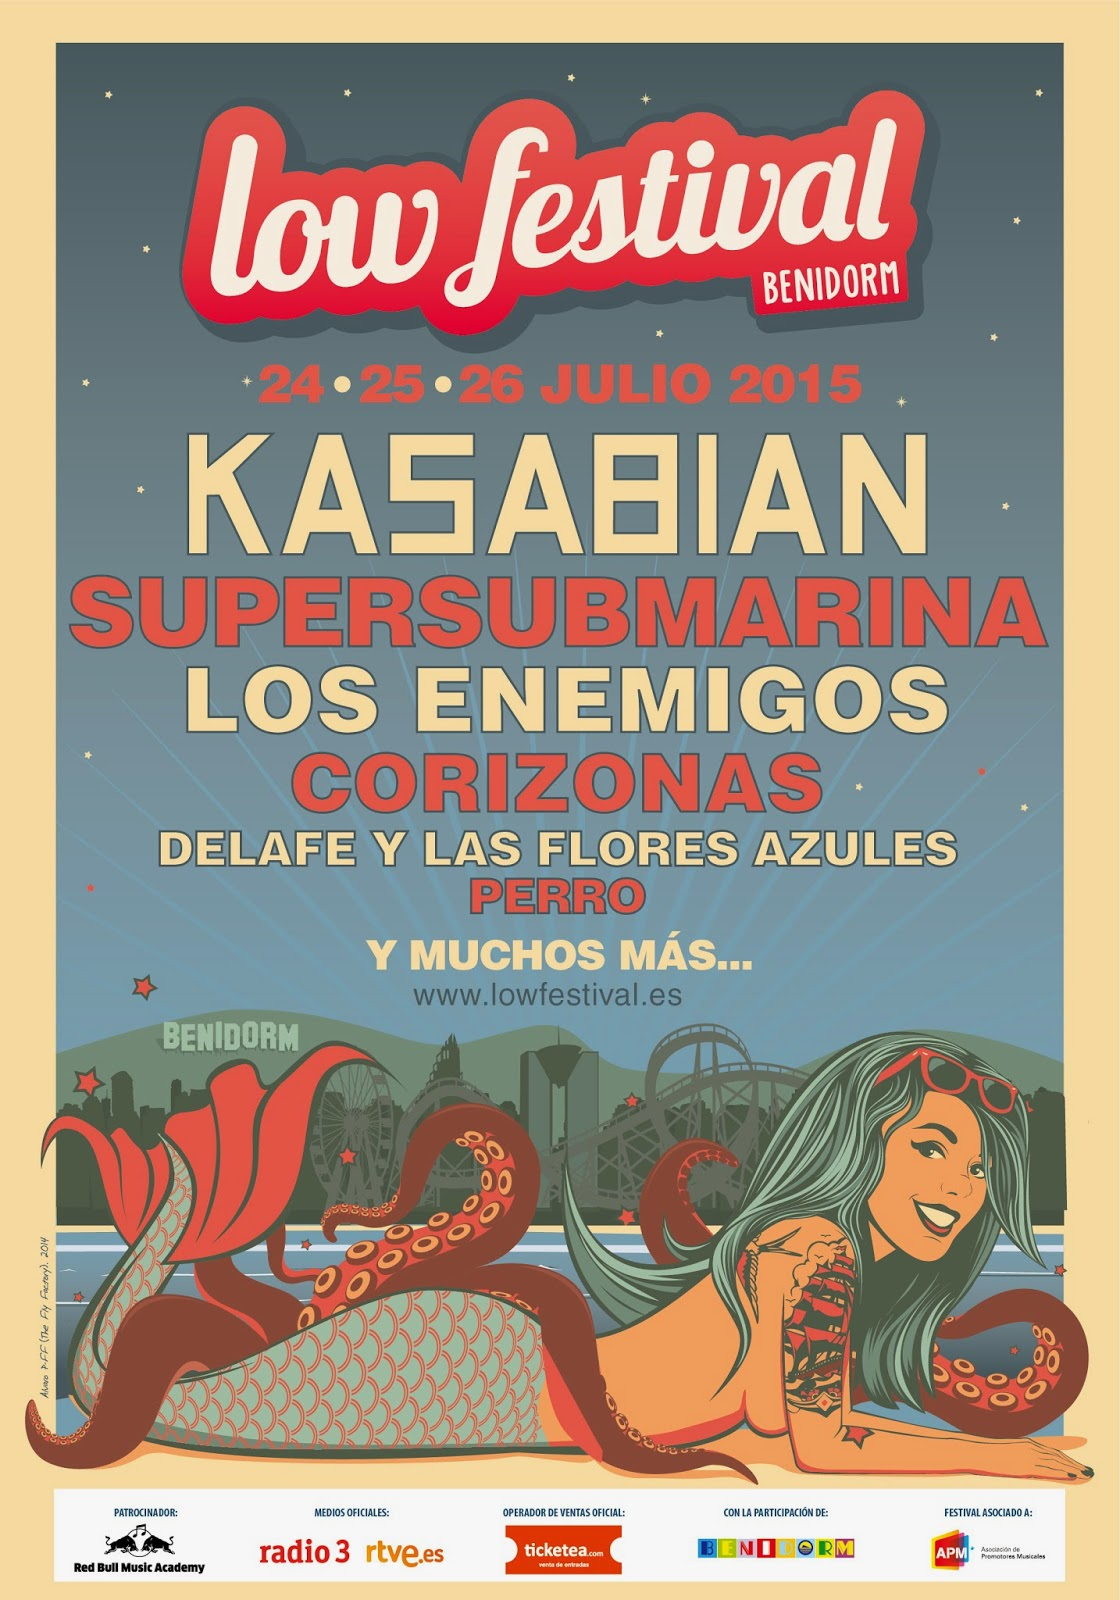 Low, Festival, 2015, cartel, logo, Festival